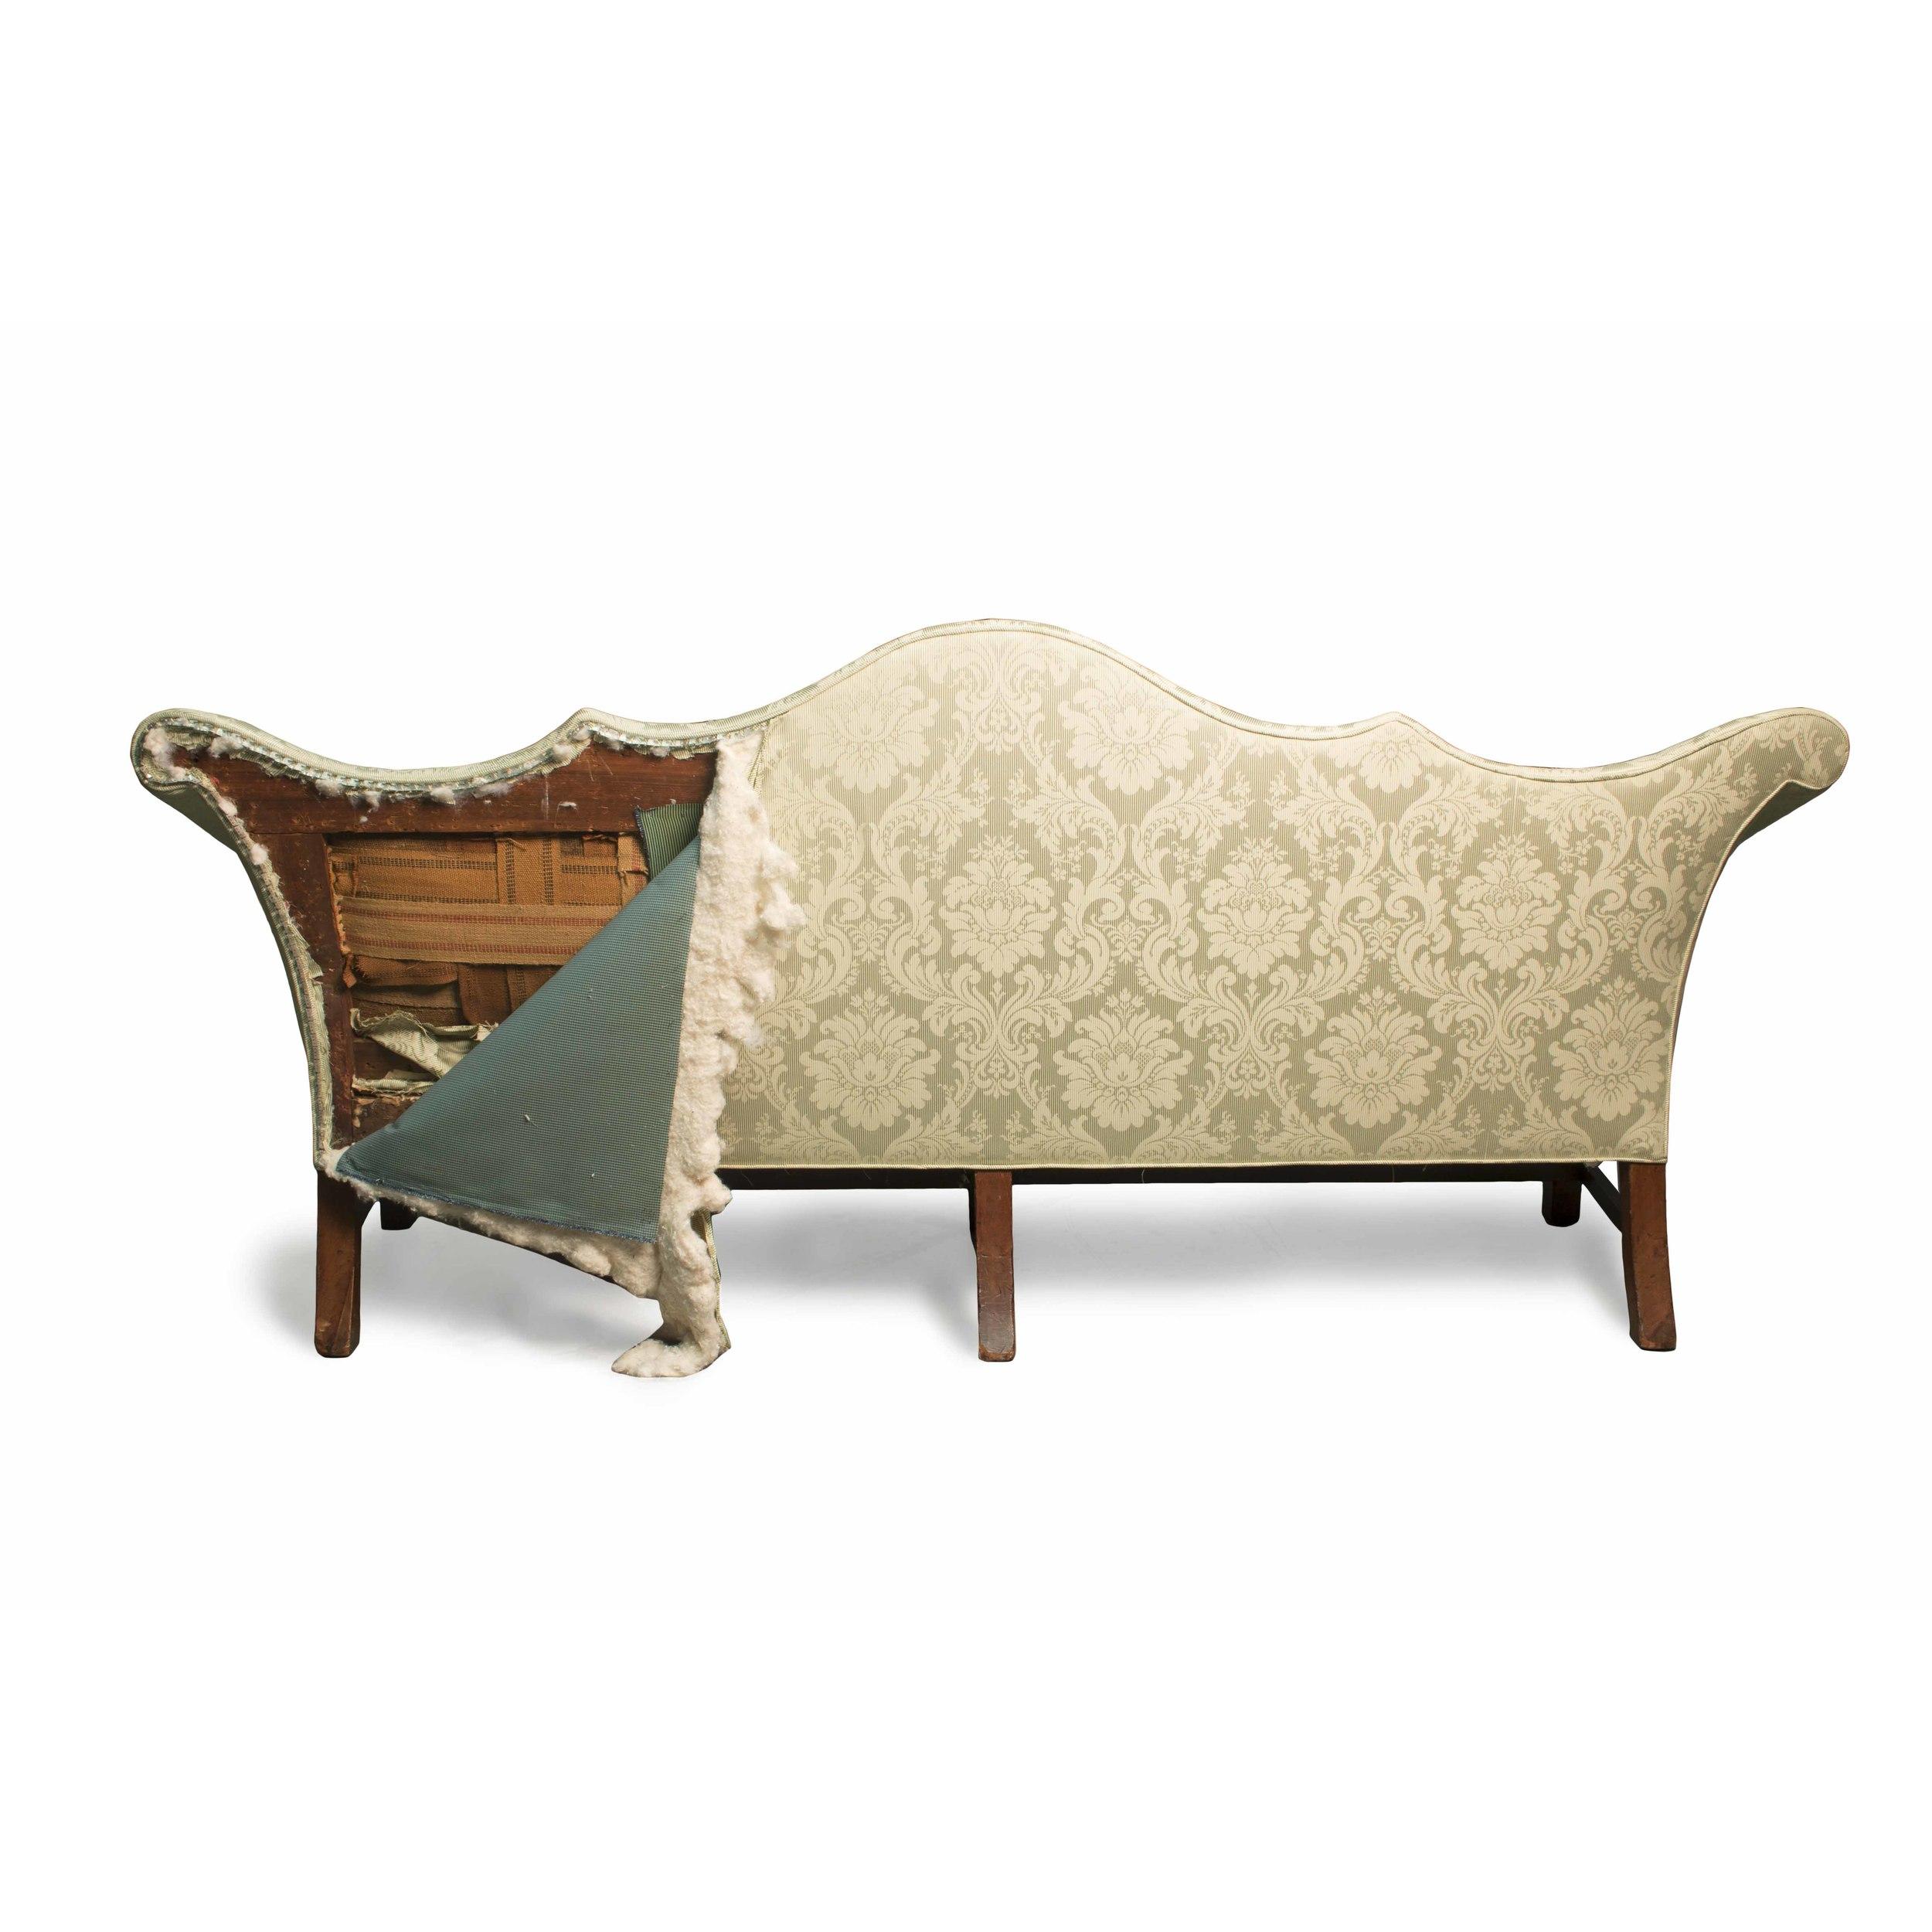 Philadelphia Double Peaked Chippendale Sofa, Ca. 1770